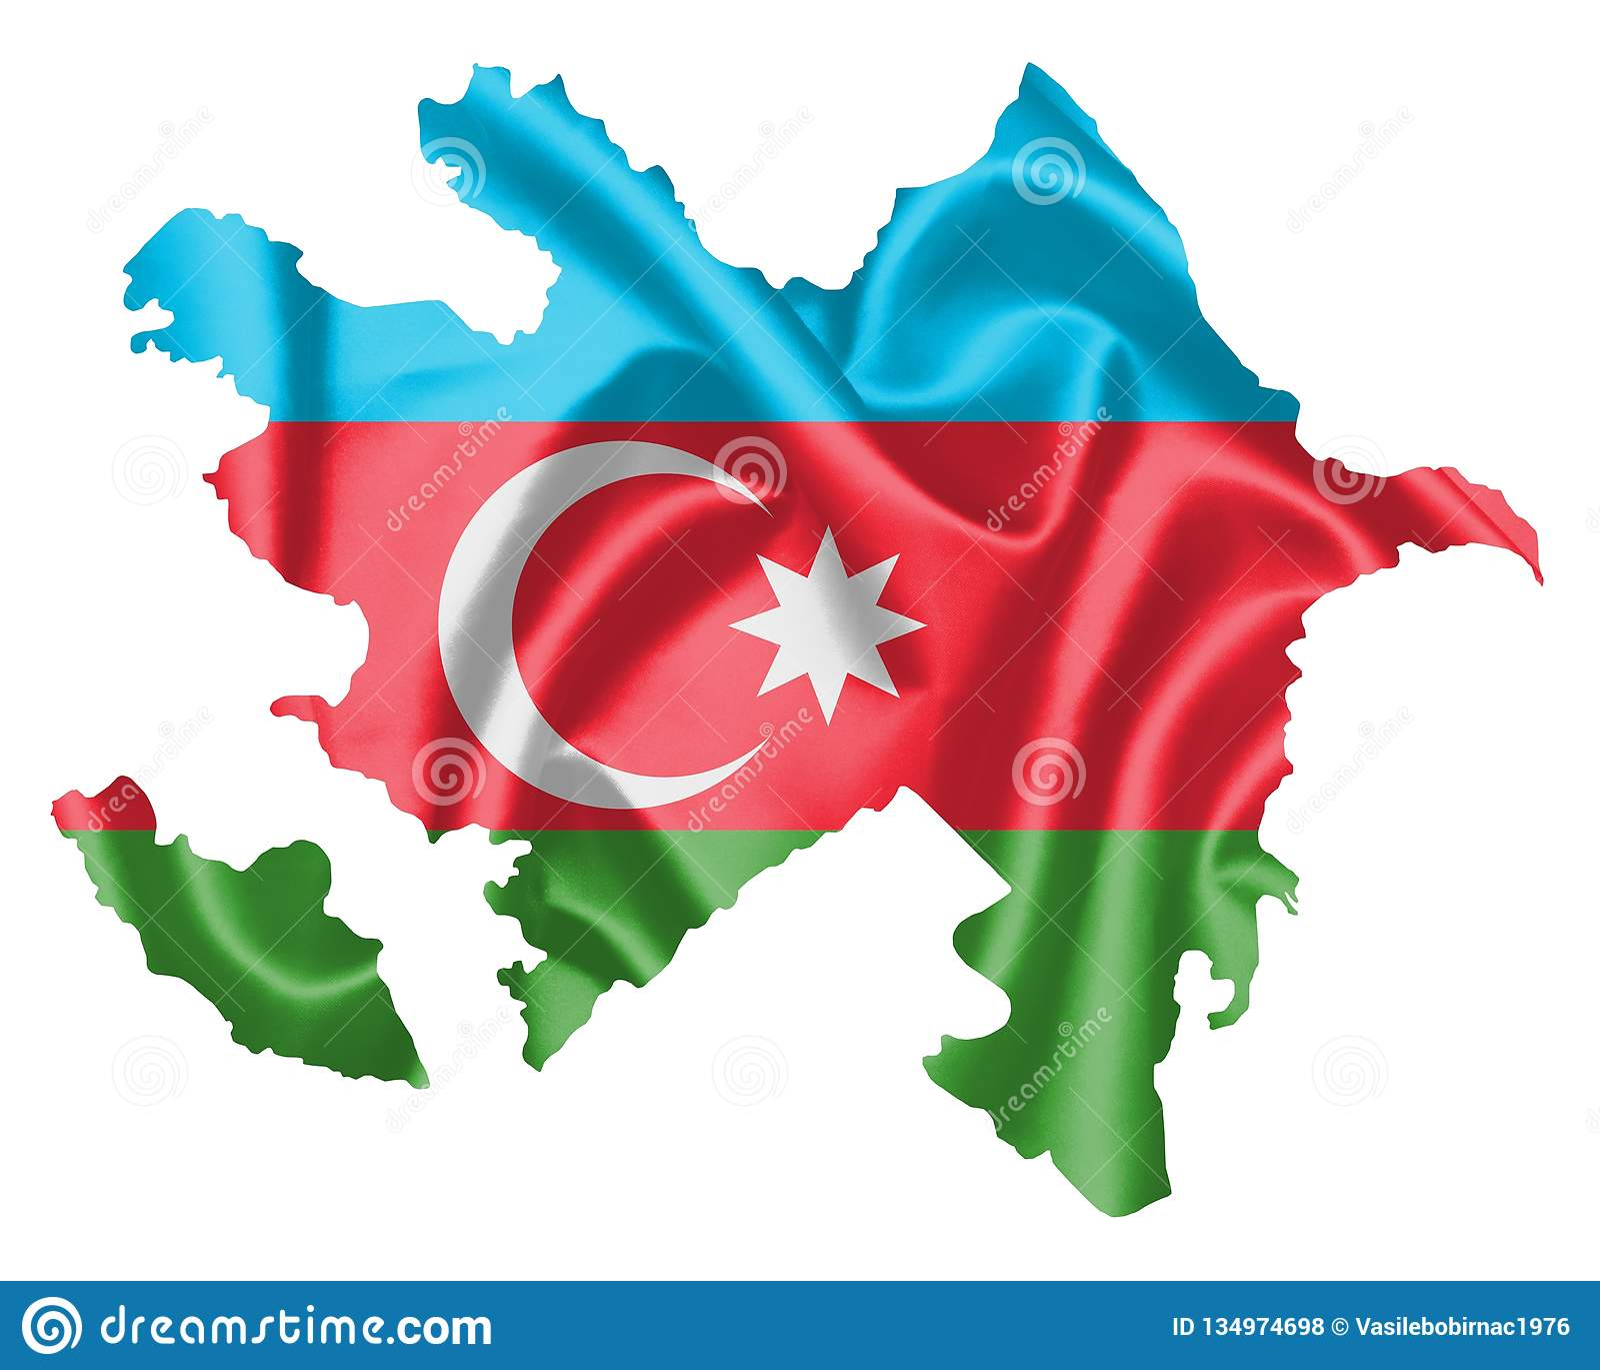 Azerbaijan Map With Flag Stock Illustration Illustration Of Design 134974698